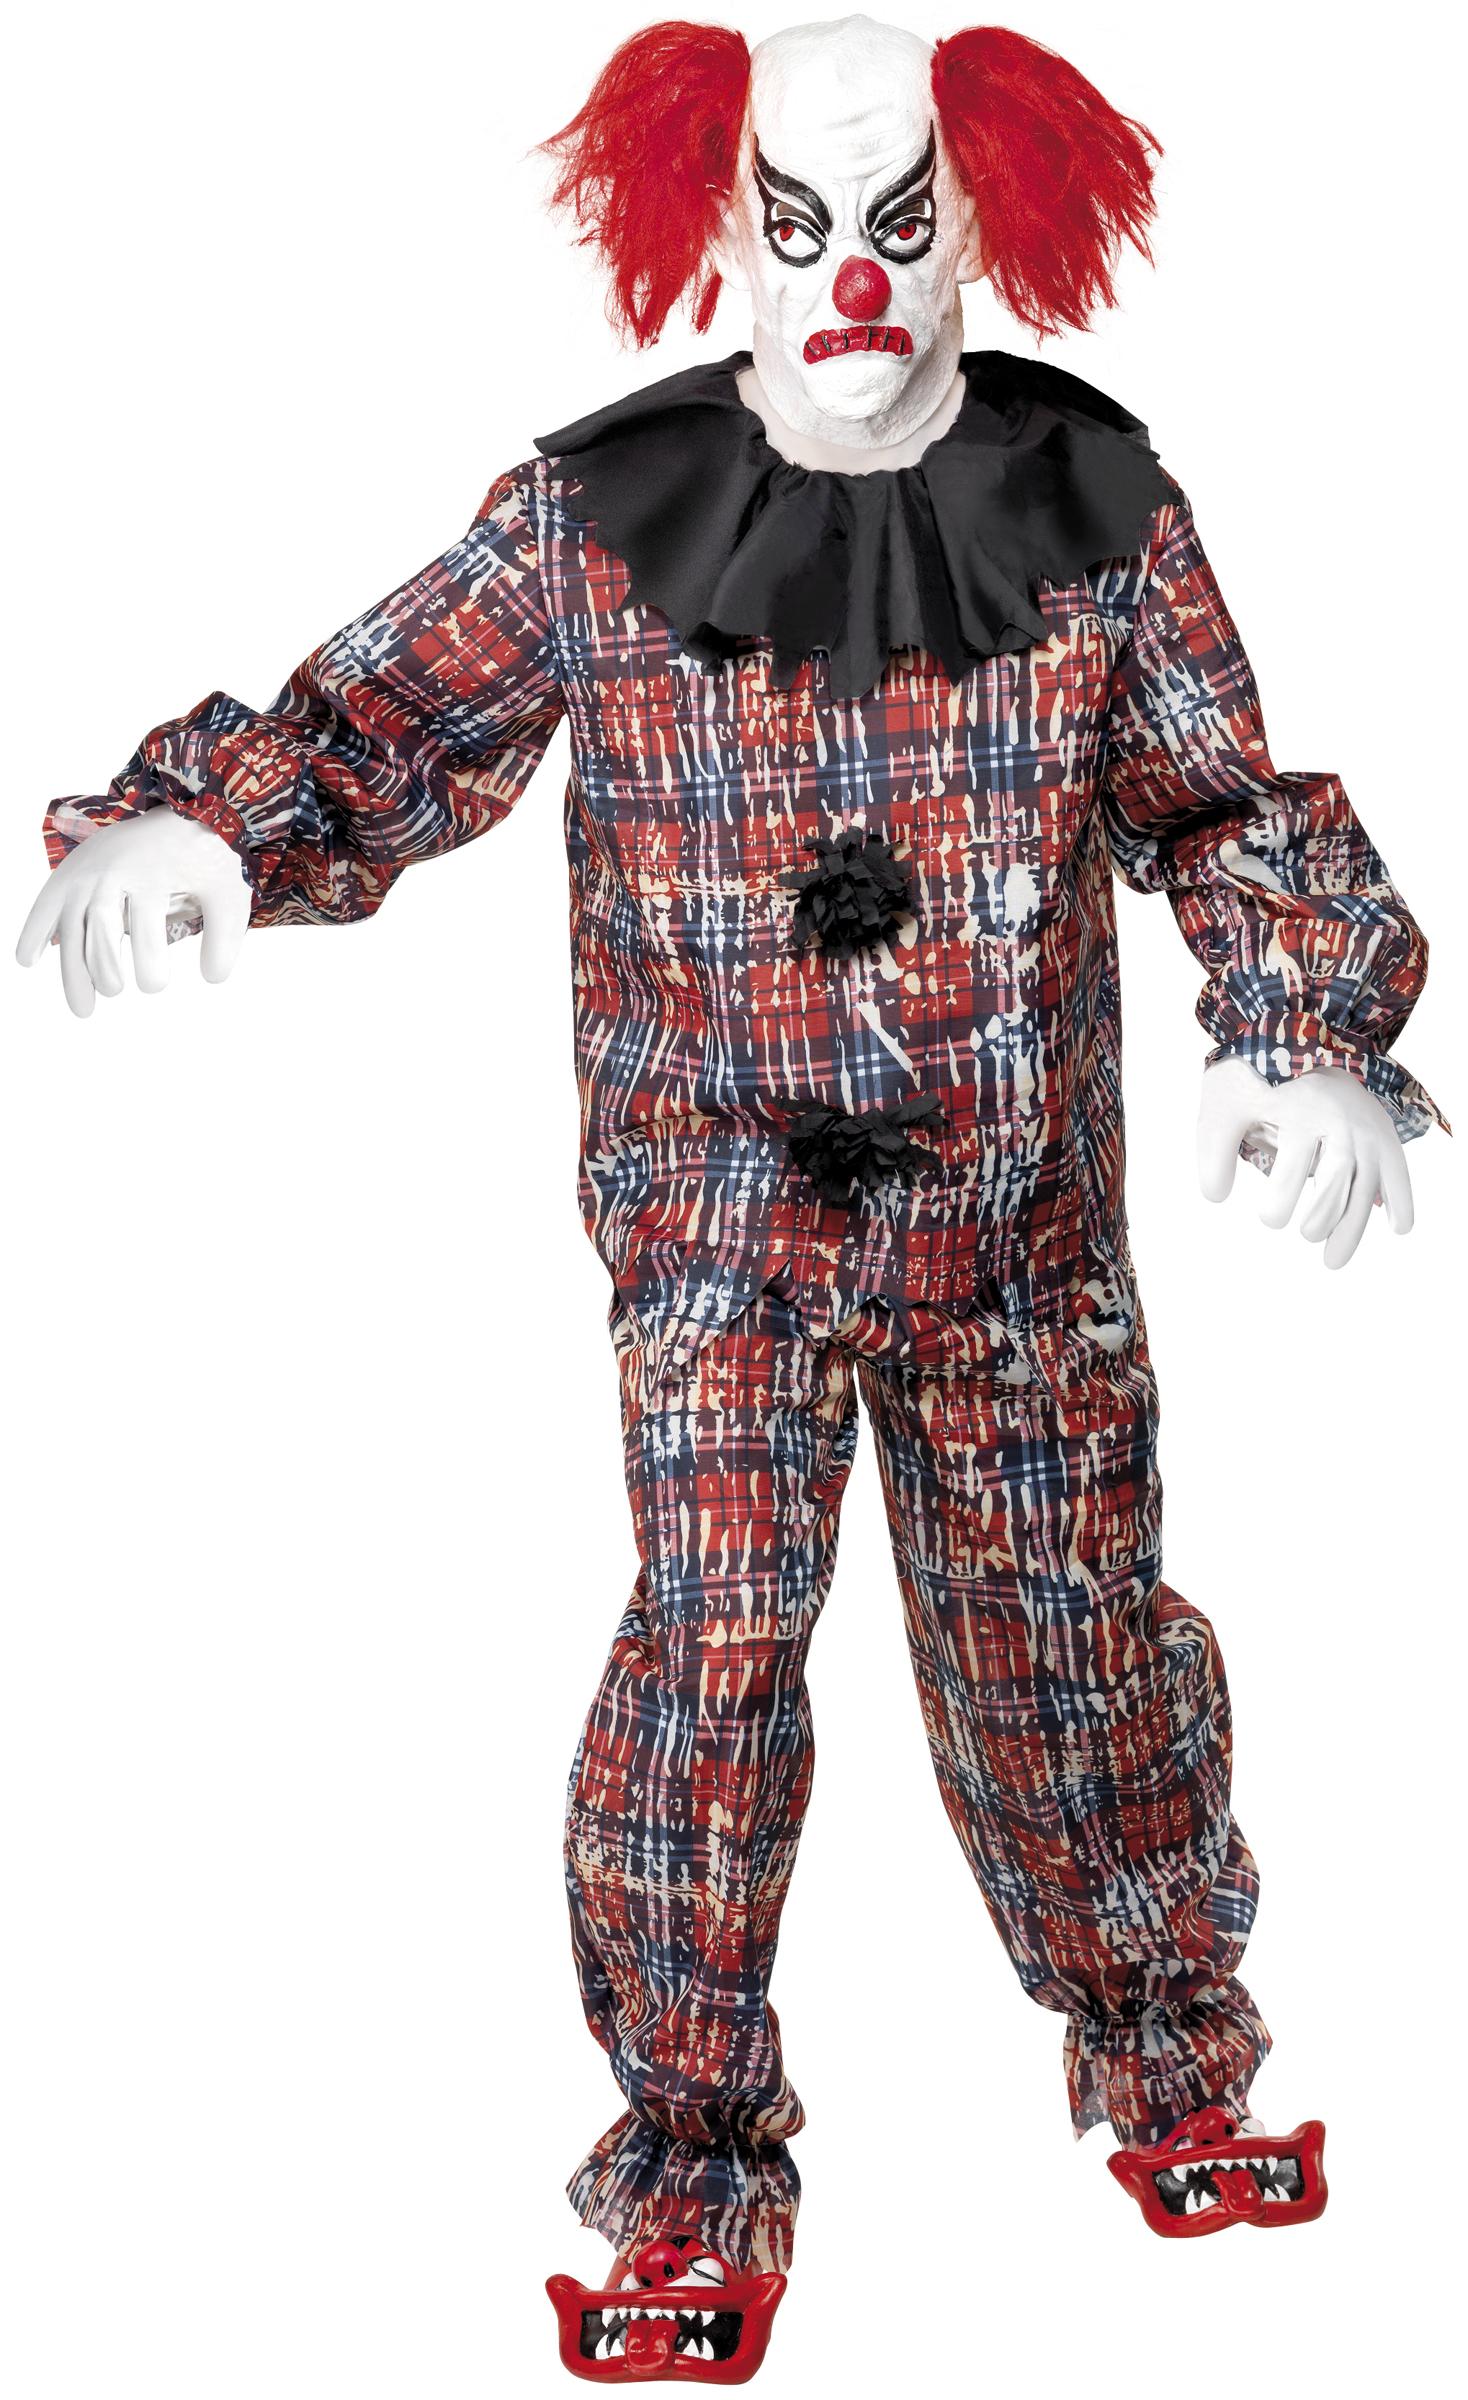 d guisement clown terrifiant costume clown effrayant homme d guisement halloween. Black Bedroom Furniture Sets. Home Design Ideas